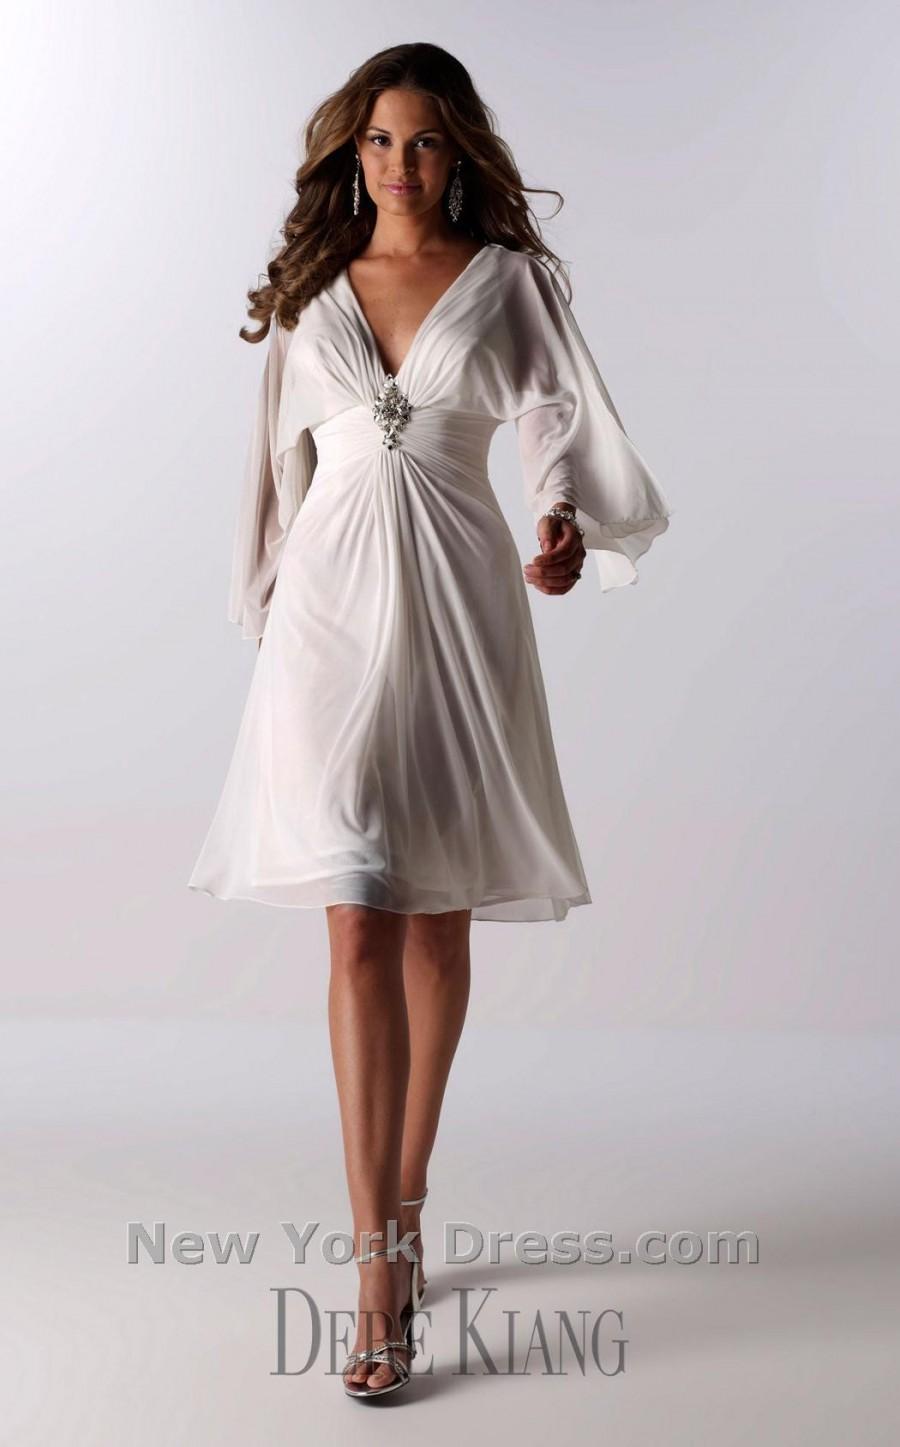 Hochzeit - Dere Kiang 11110 - Charming Wedding Party Dresses